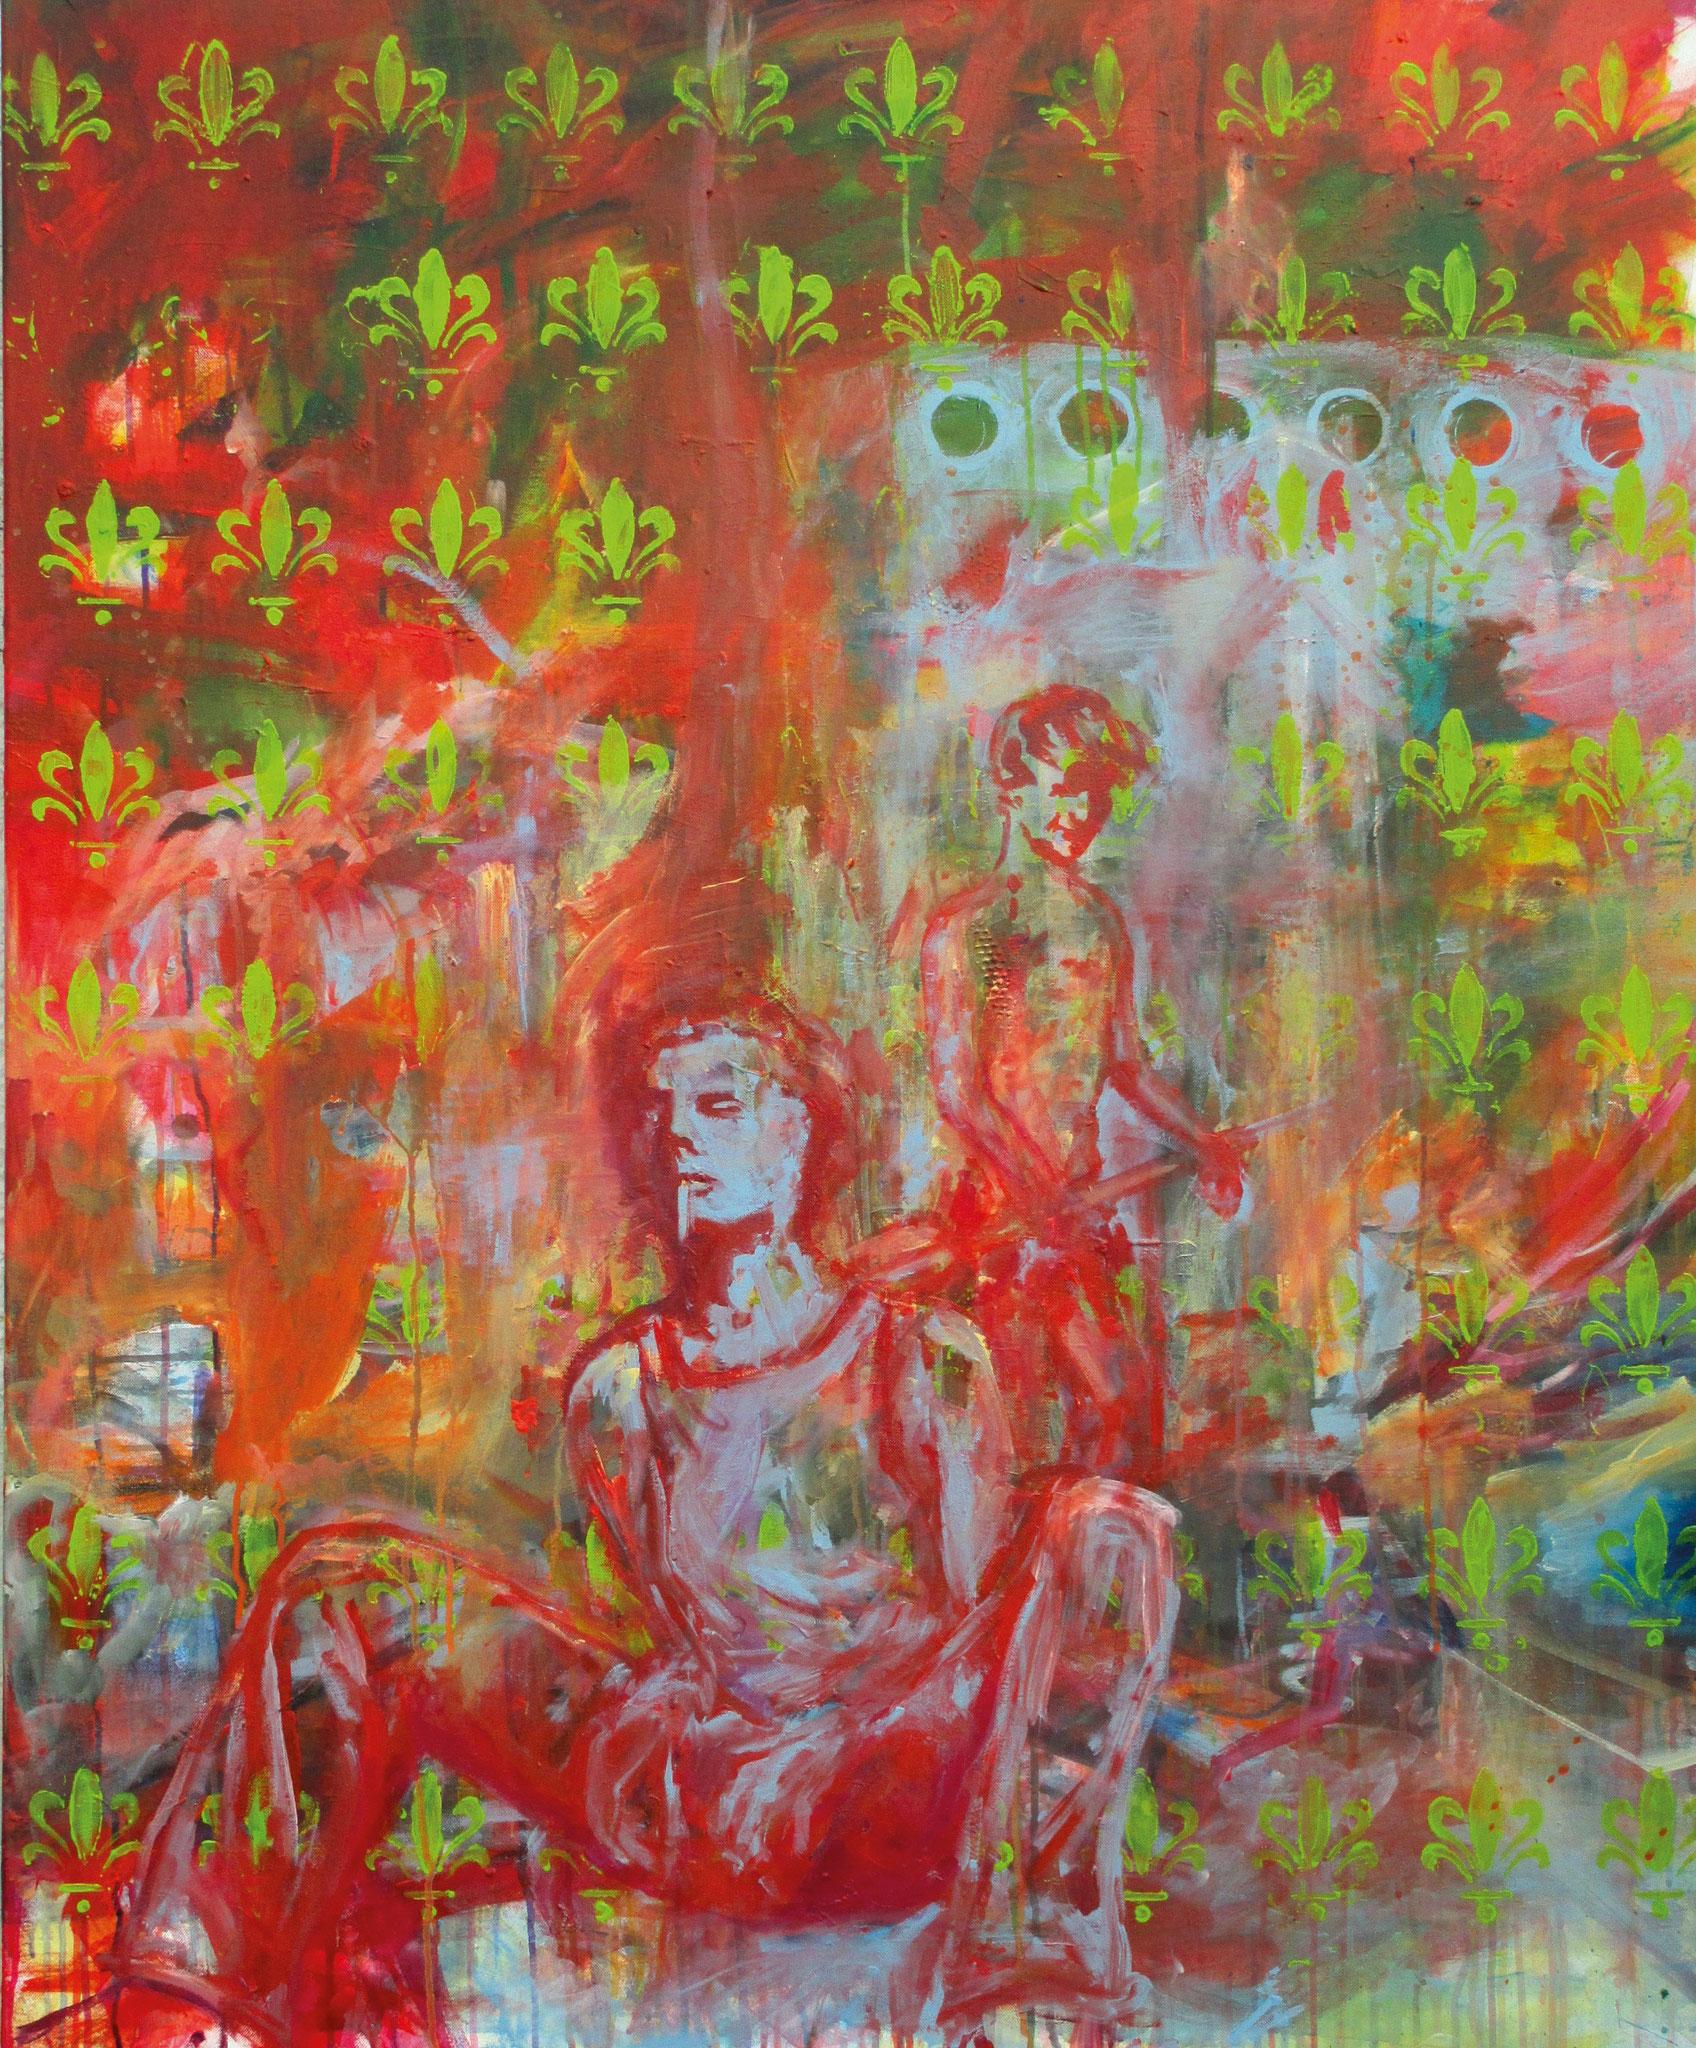 lost and found I, Acryl auf Leinwand, 120 x 100 cm, 2014